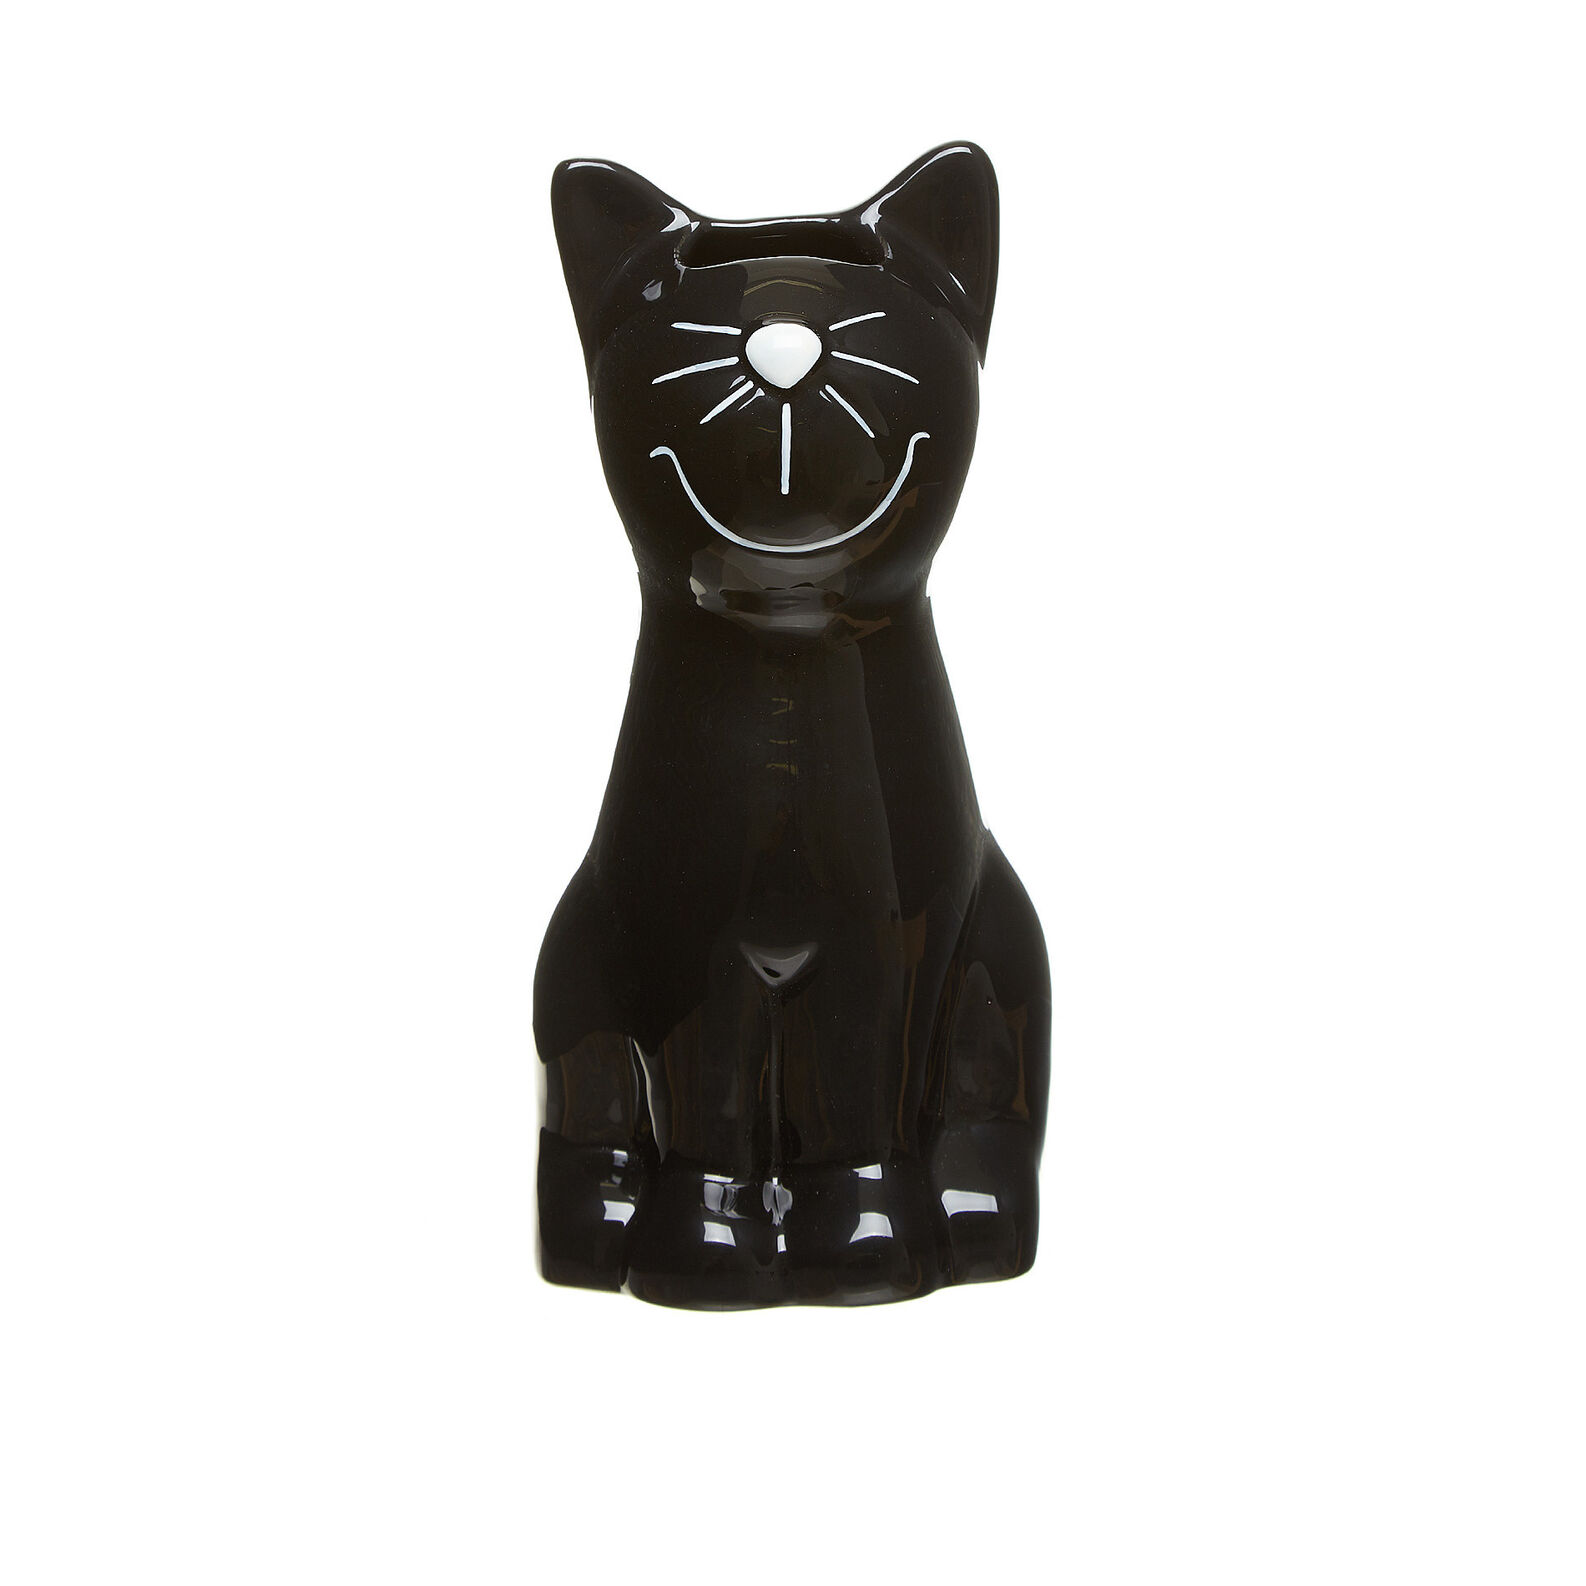 Cat-shaped ceramic humidifier